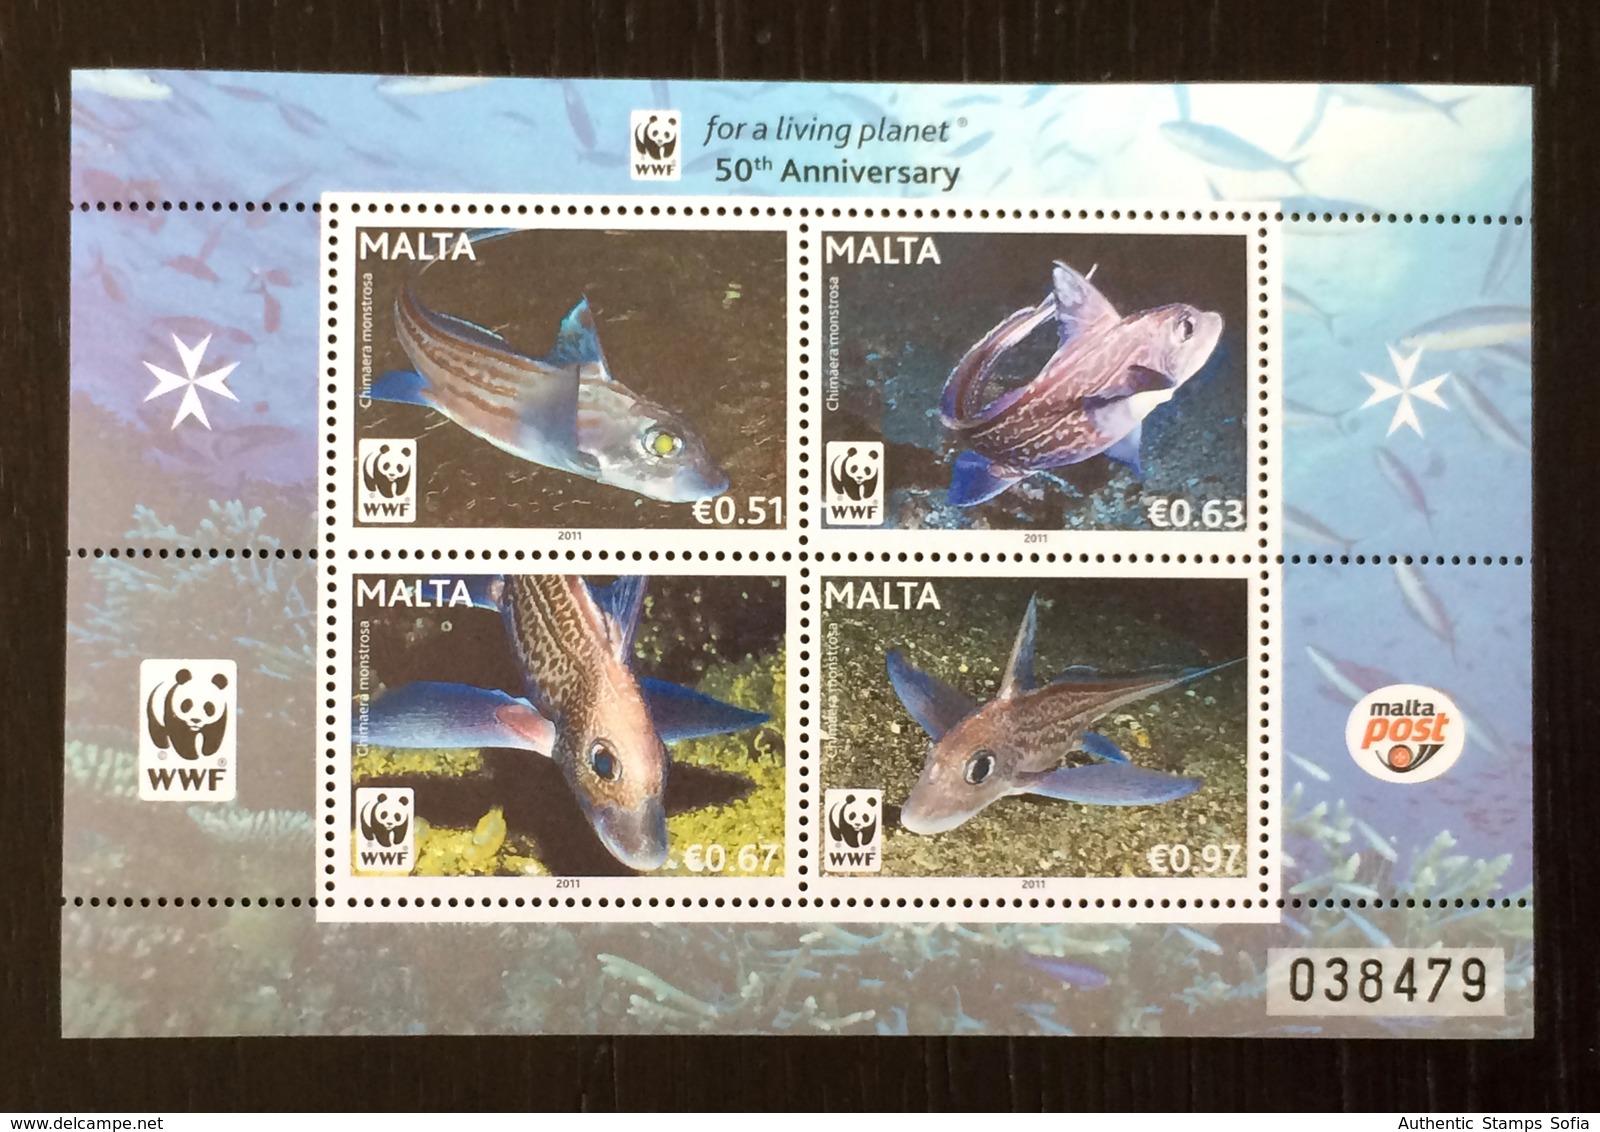 Malta 2011; WWF Marine Life, Fauna, Fishes; MNH VF** Scarce Sheet!! - W.W.F.